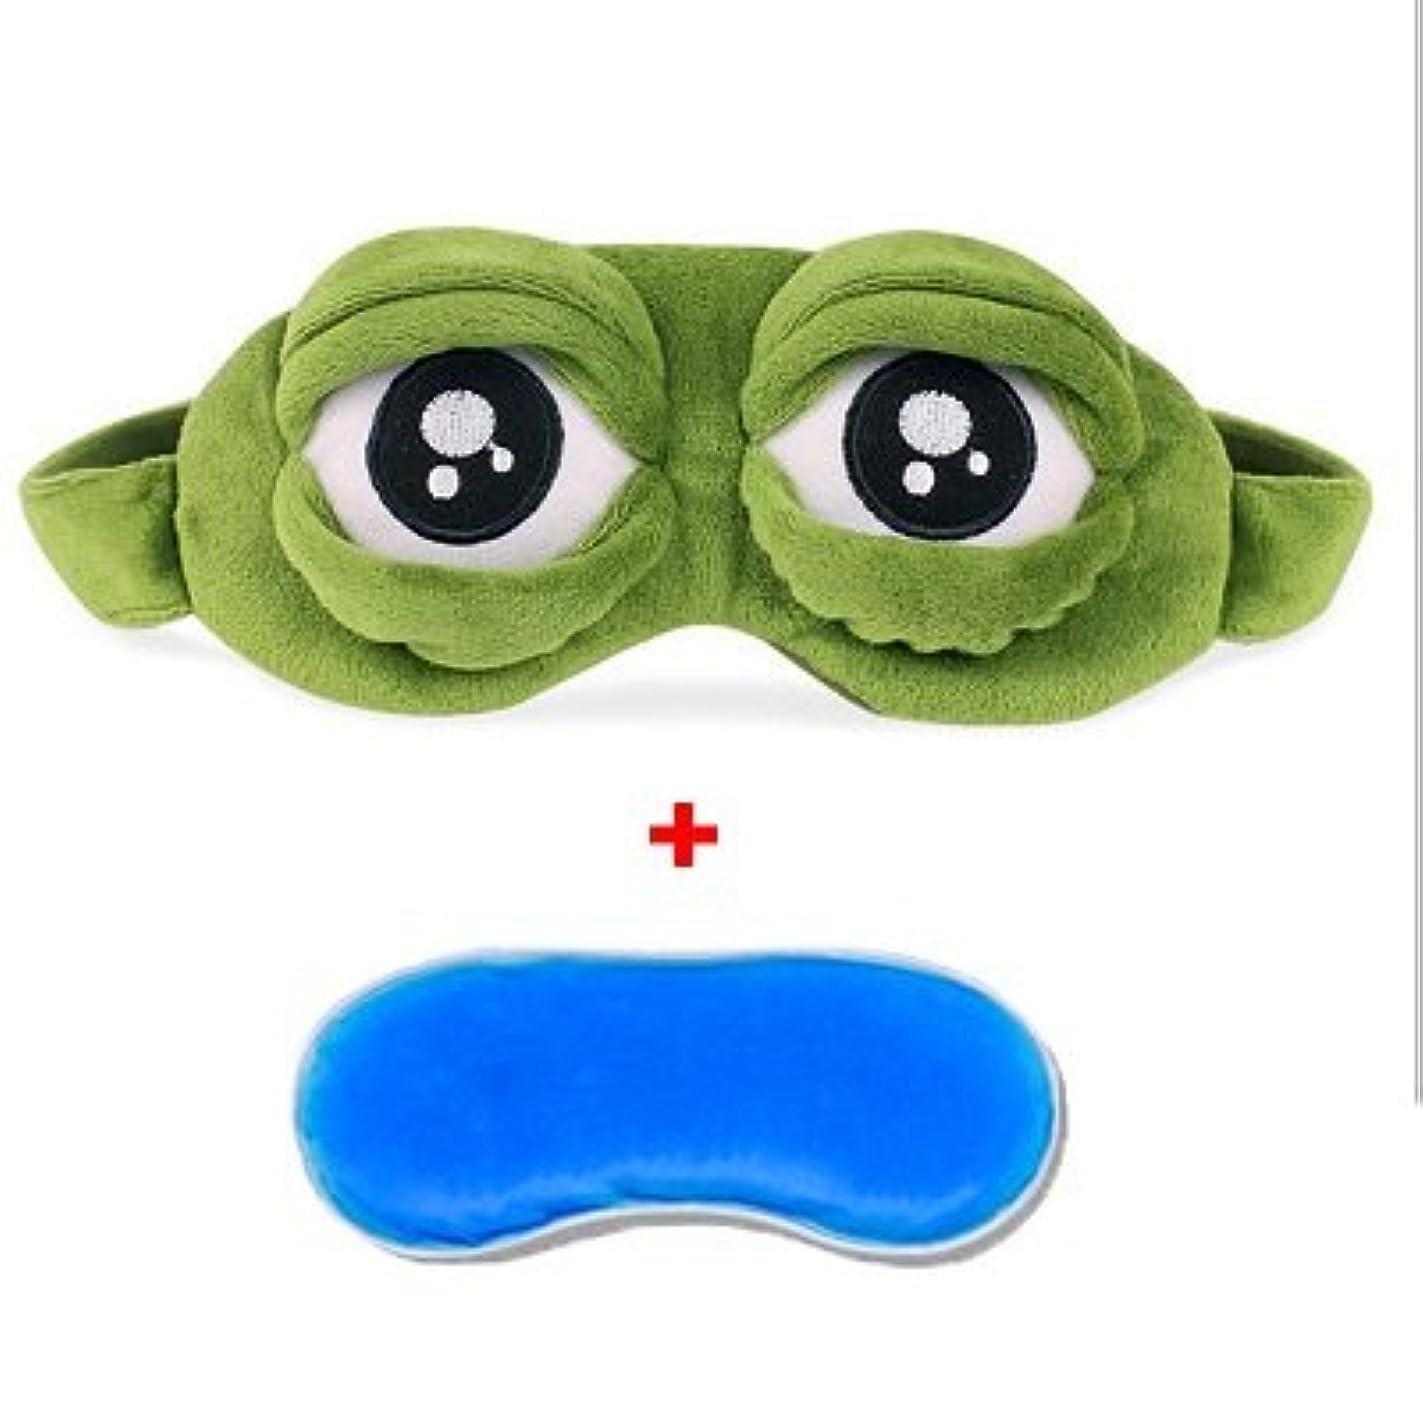 NOTE 3d悲しいカエル睡眠マスク睡眠補助目隠しアイスカバーアイシェードぬいぐるみアニメコスプレ衣装面白いおもちゃアイパッチ